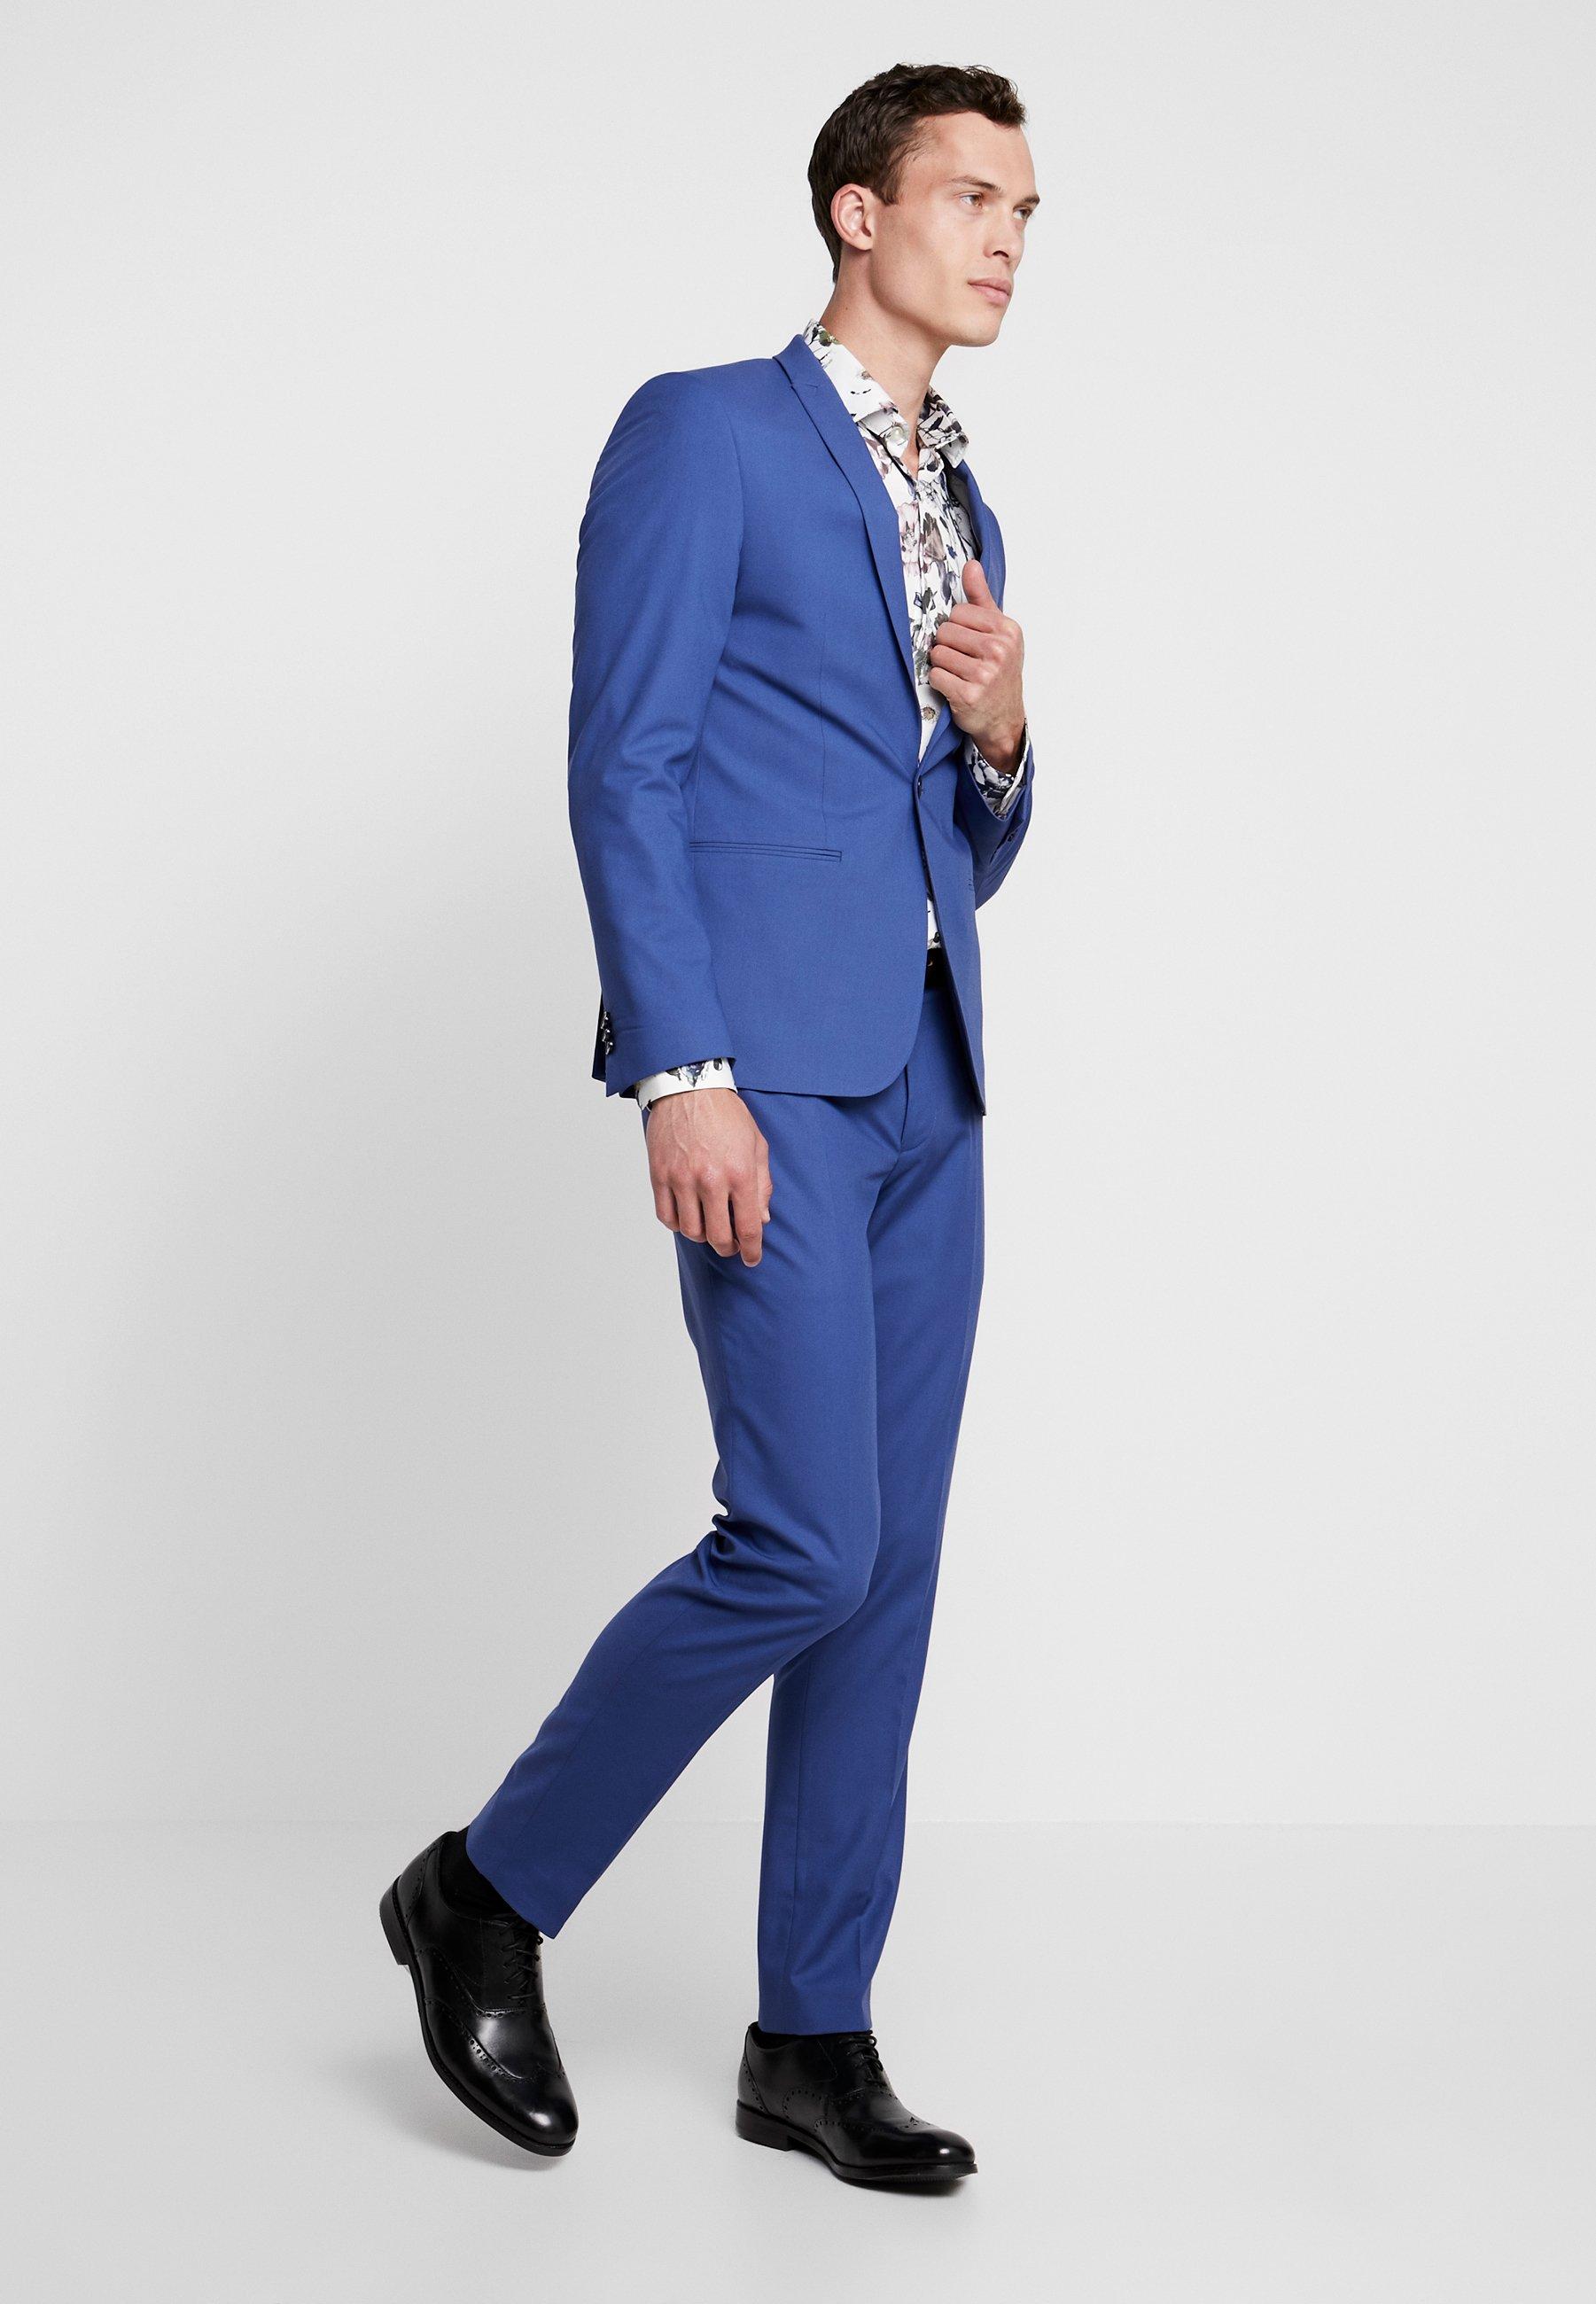 Gothenburg Denim Viggo Blue SuitCostume BxCedor